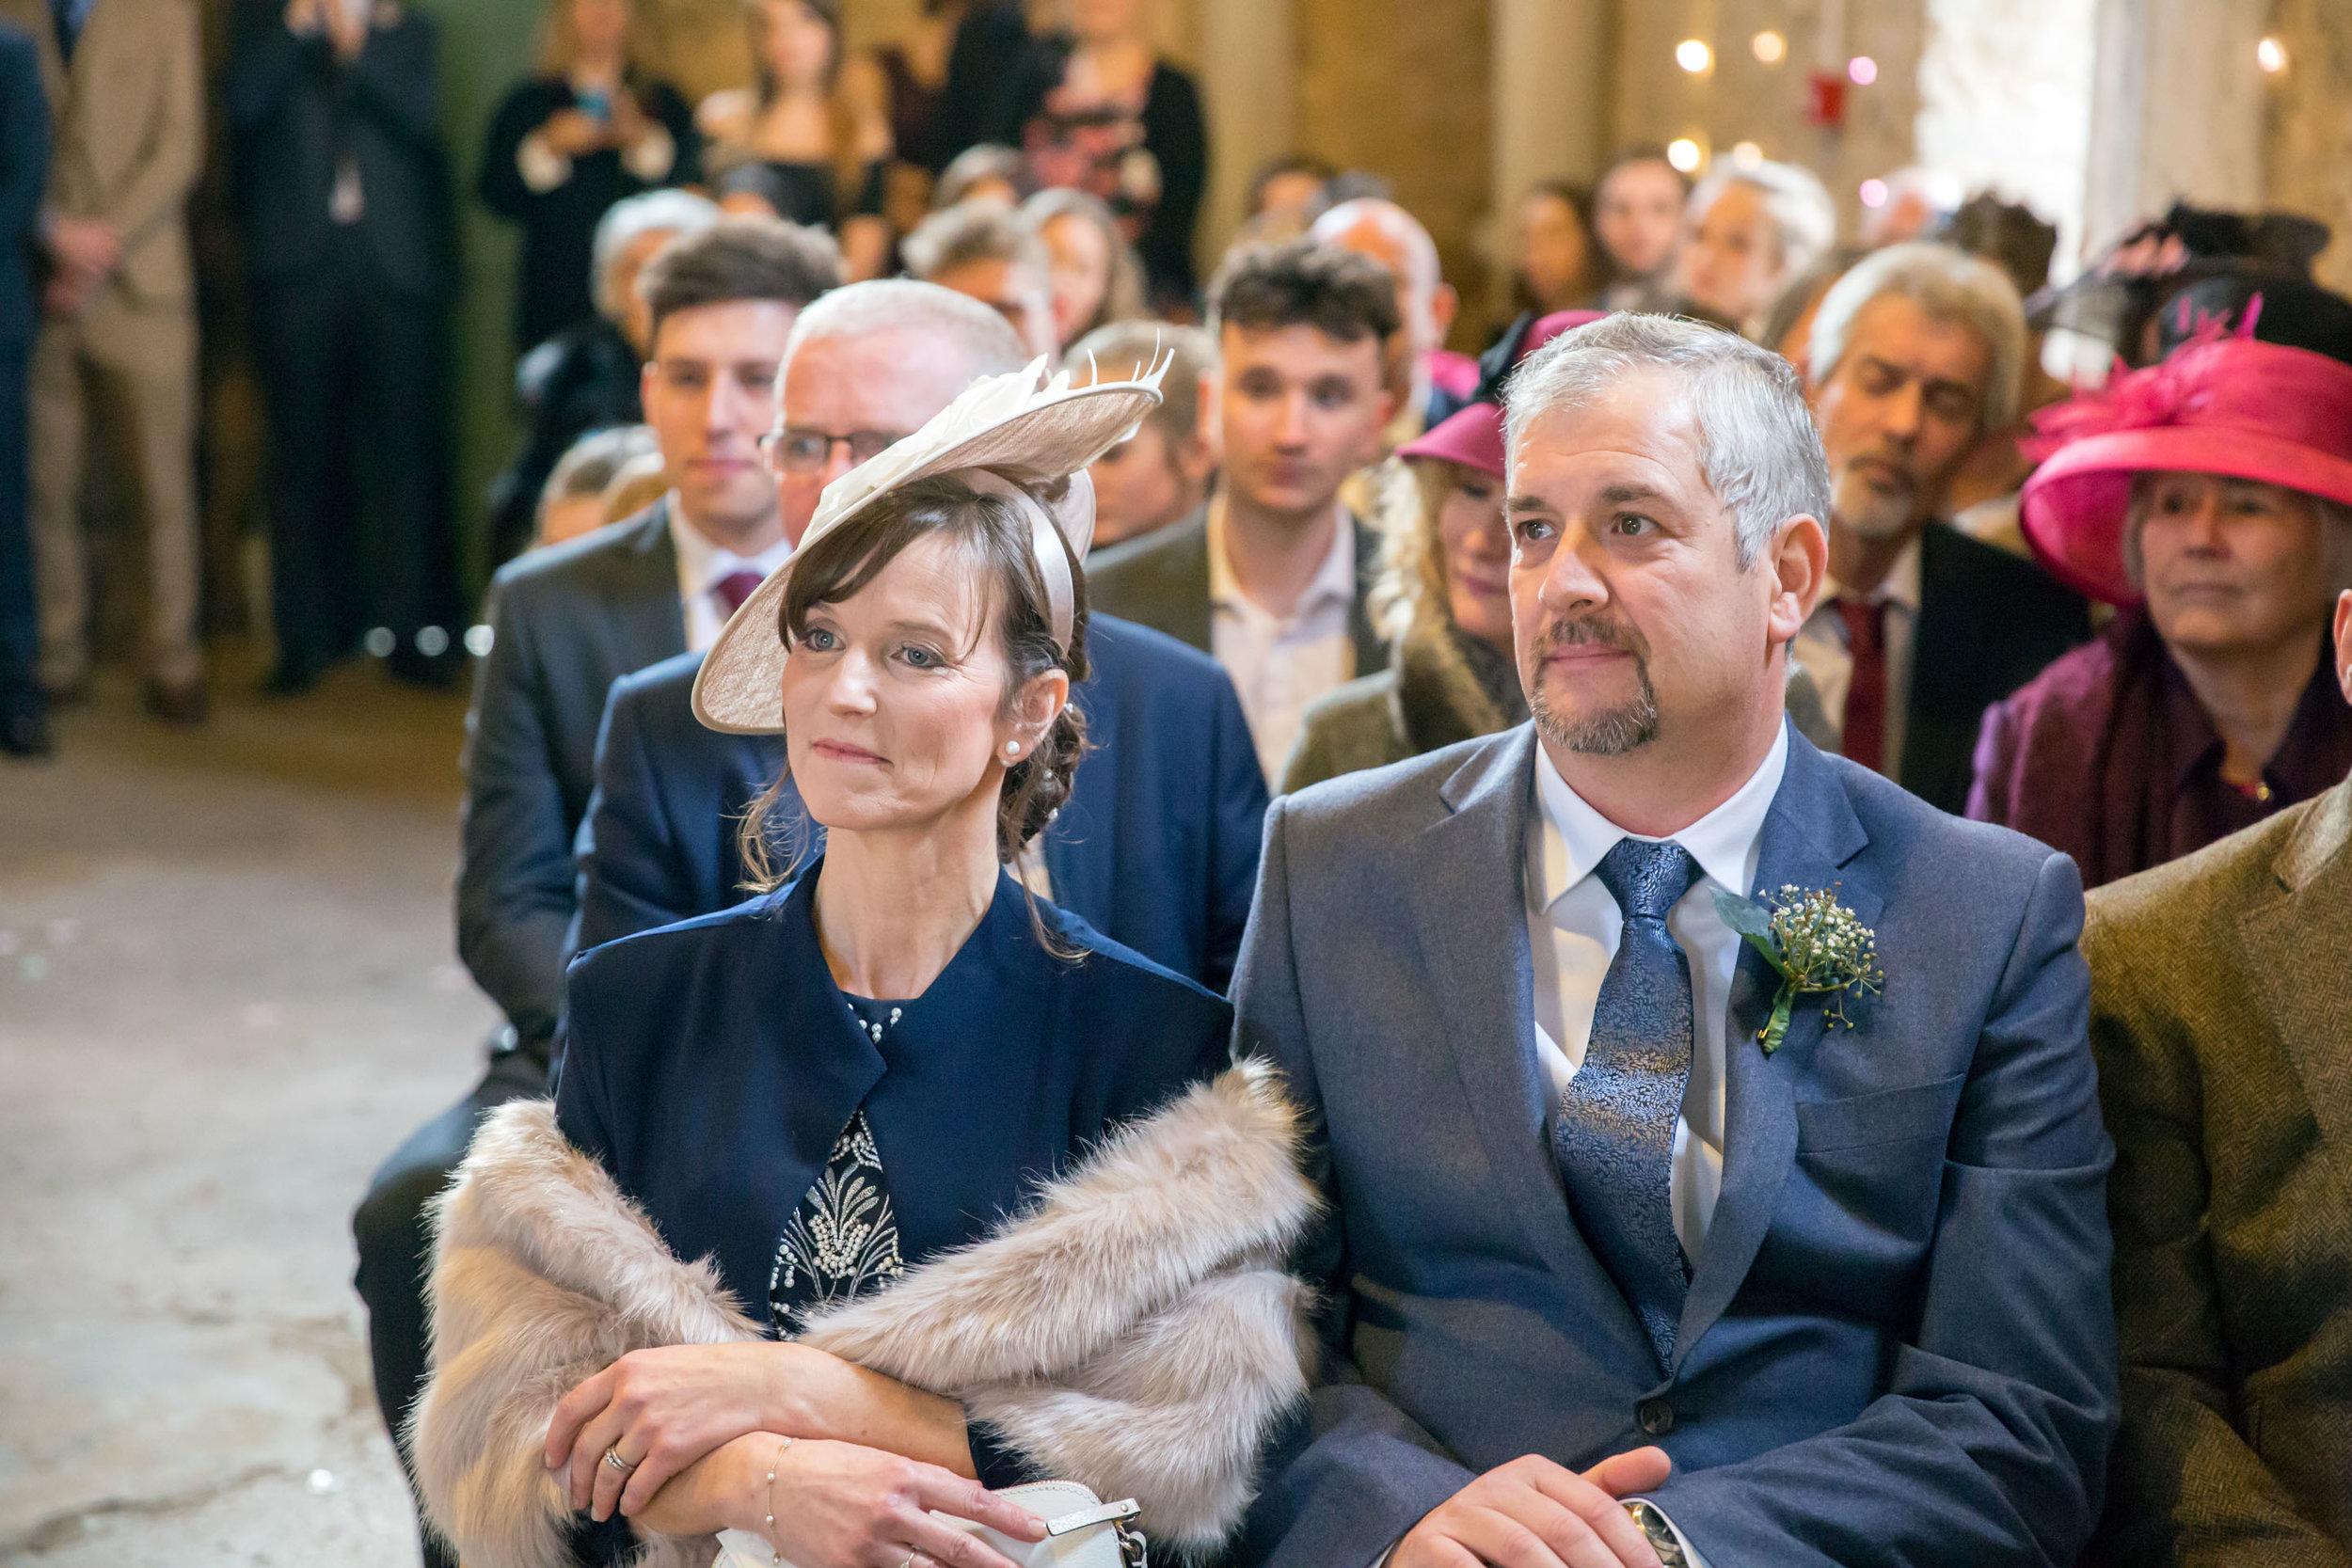 Jess & Ben - Bristol Wedding Photographer - Wright Wedding Photography - 69